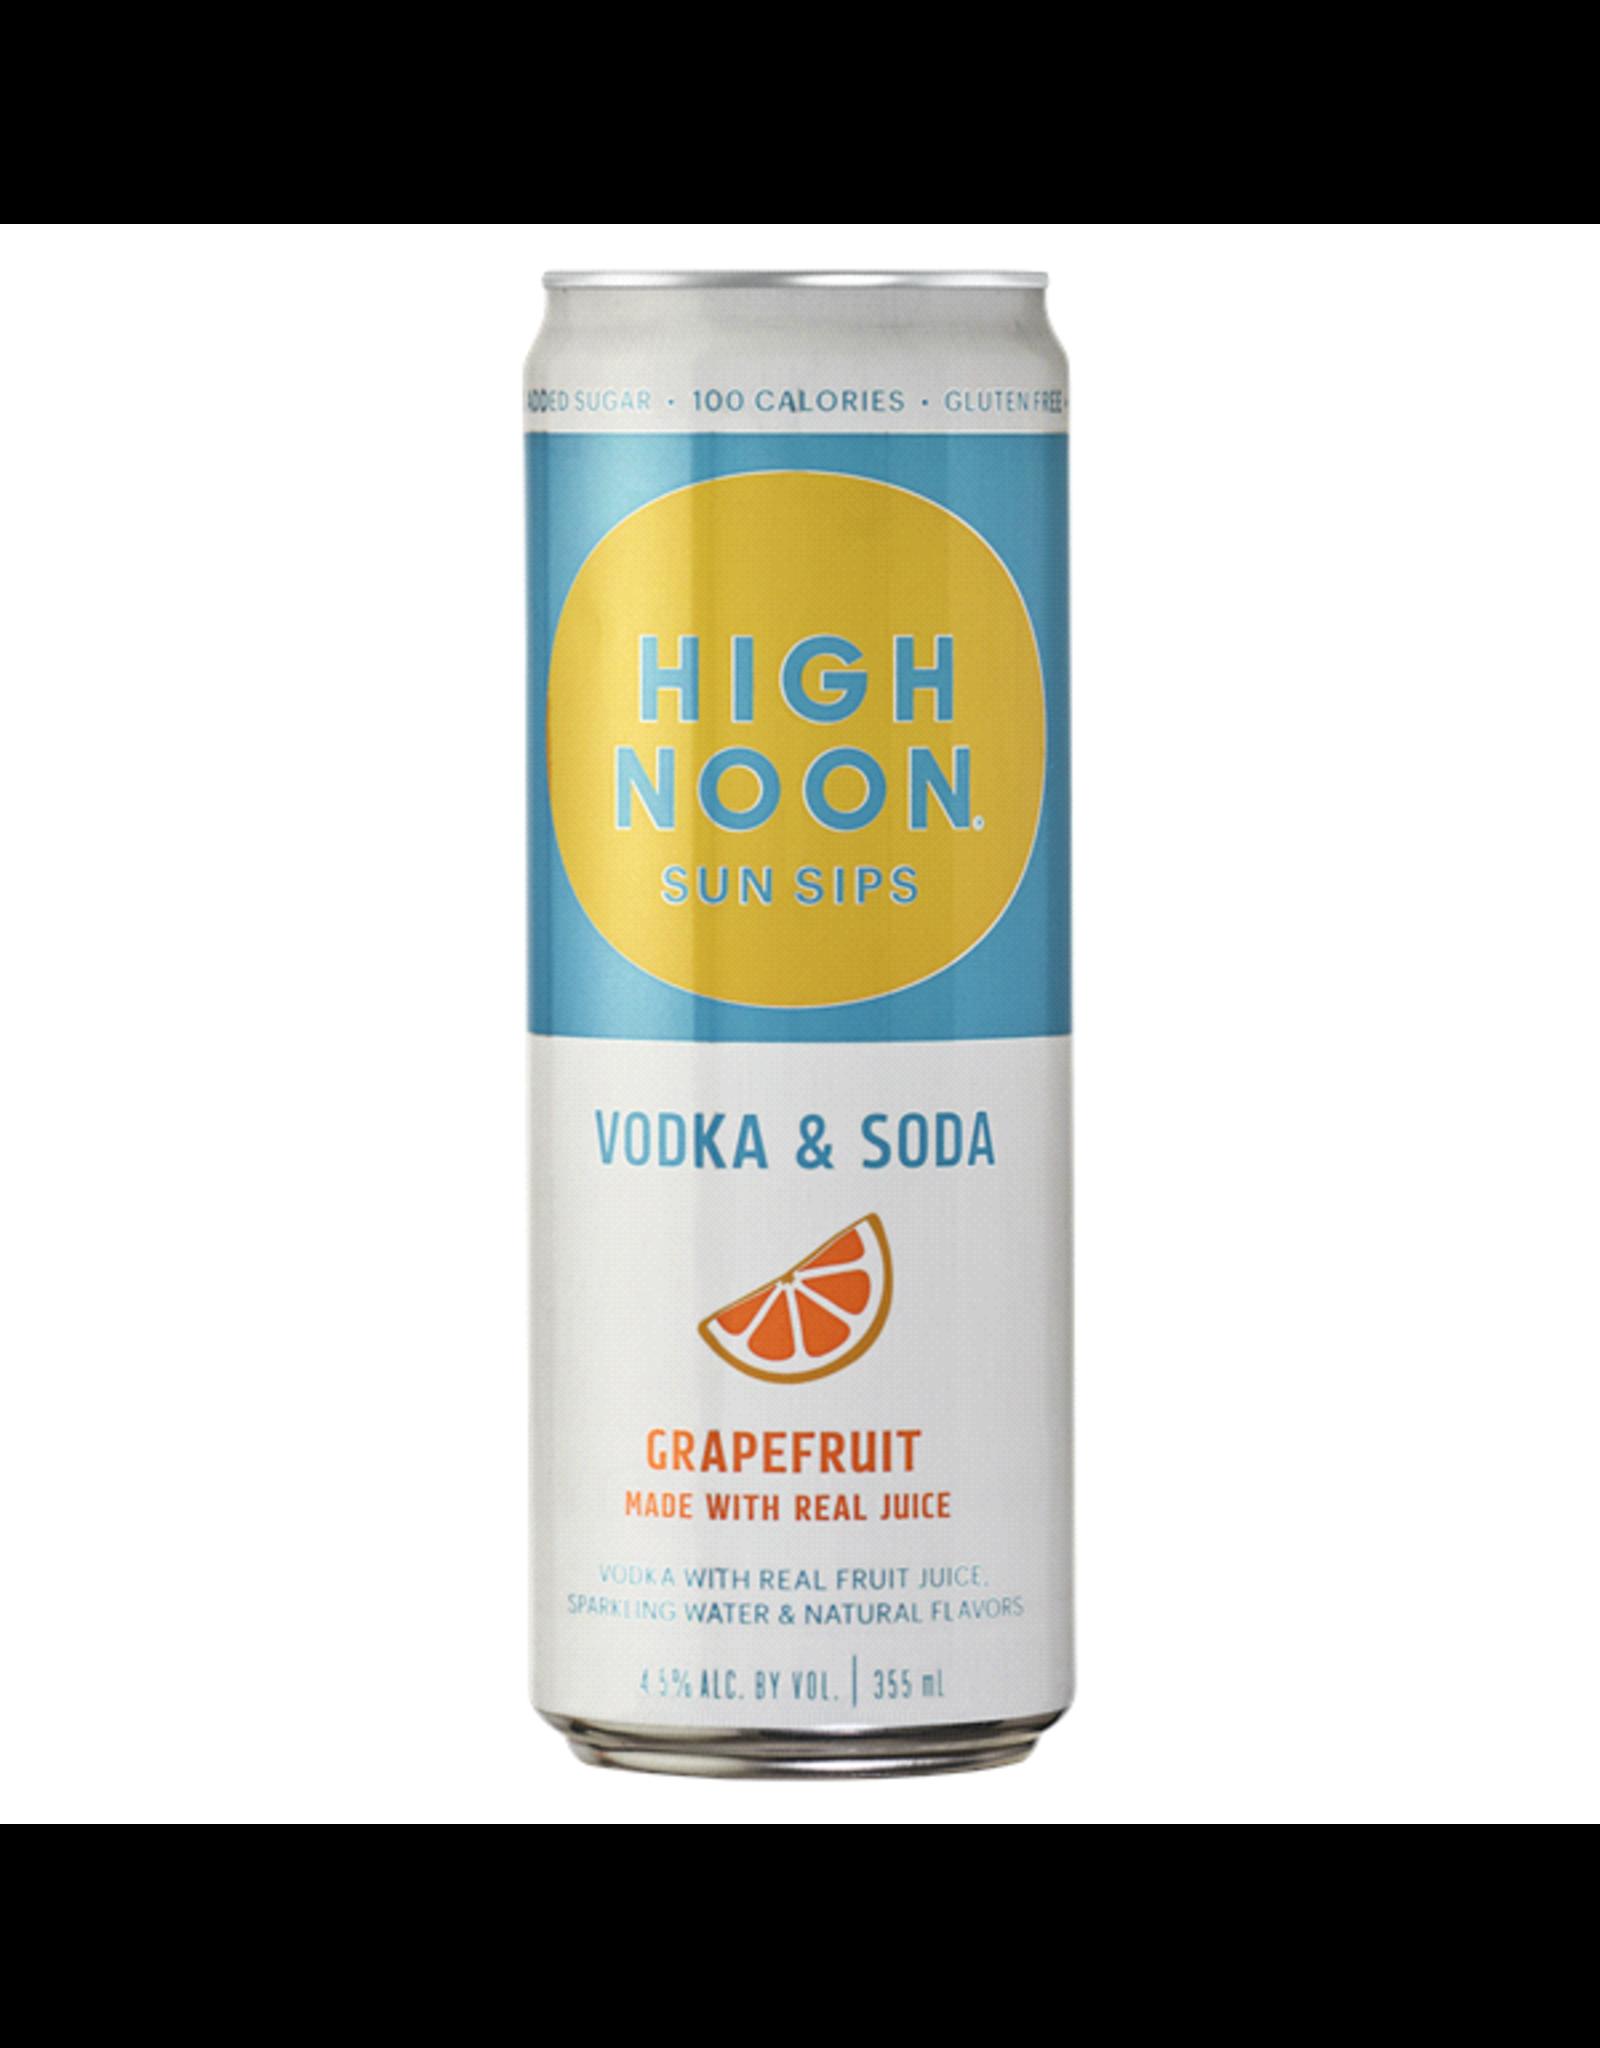 High noon grapefruit 4/12ozcn